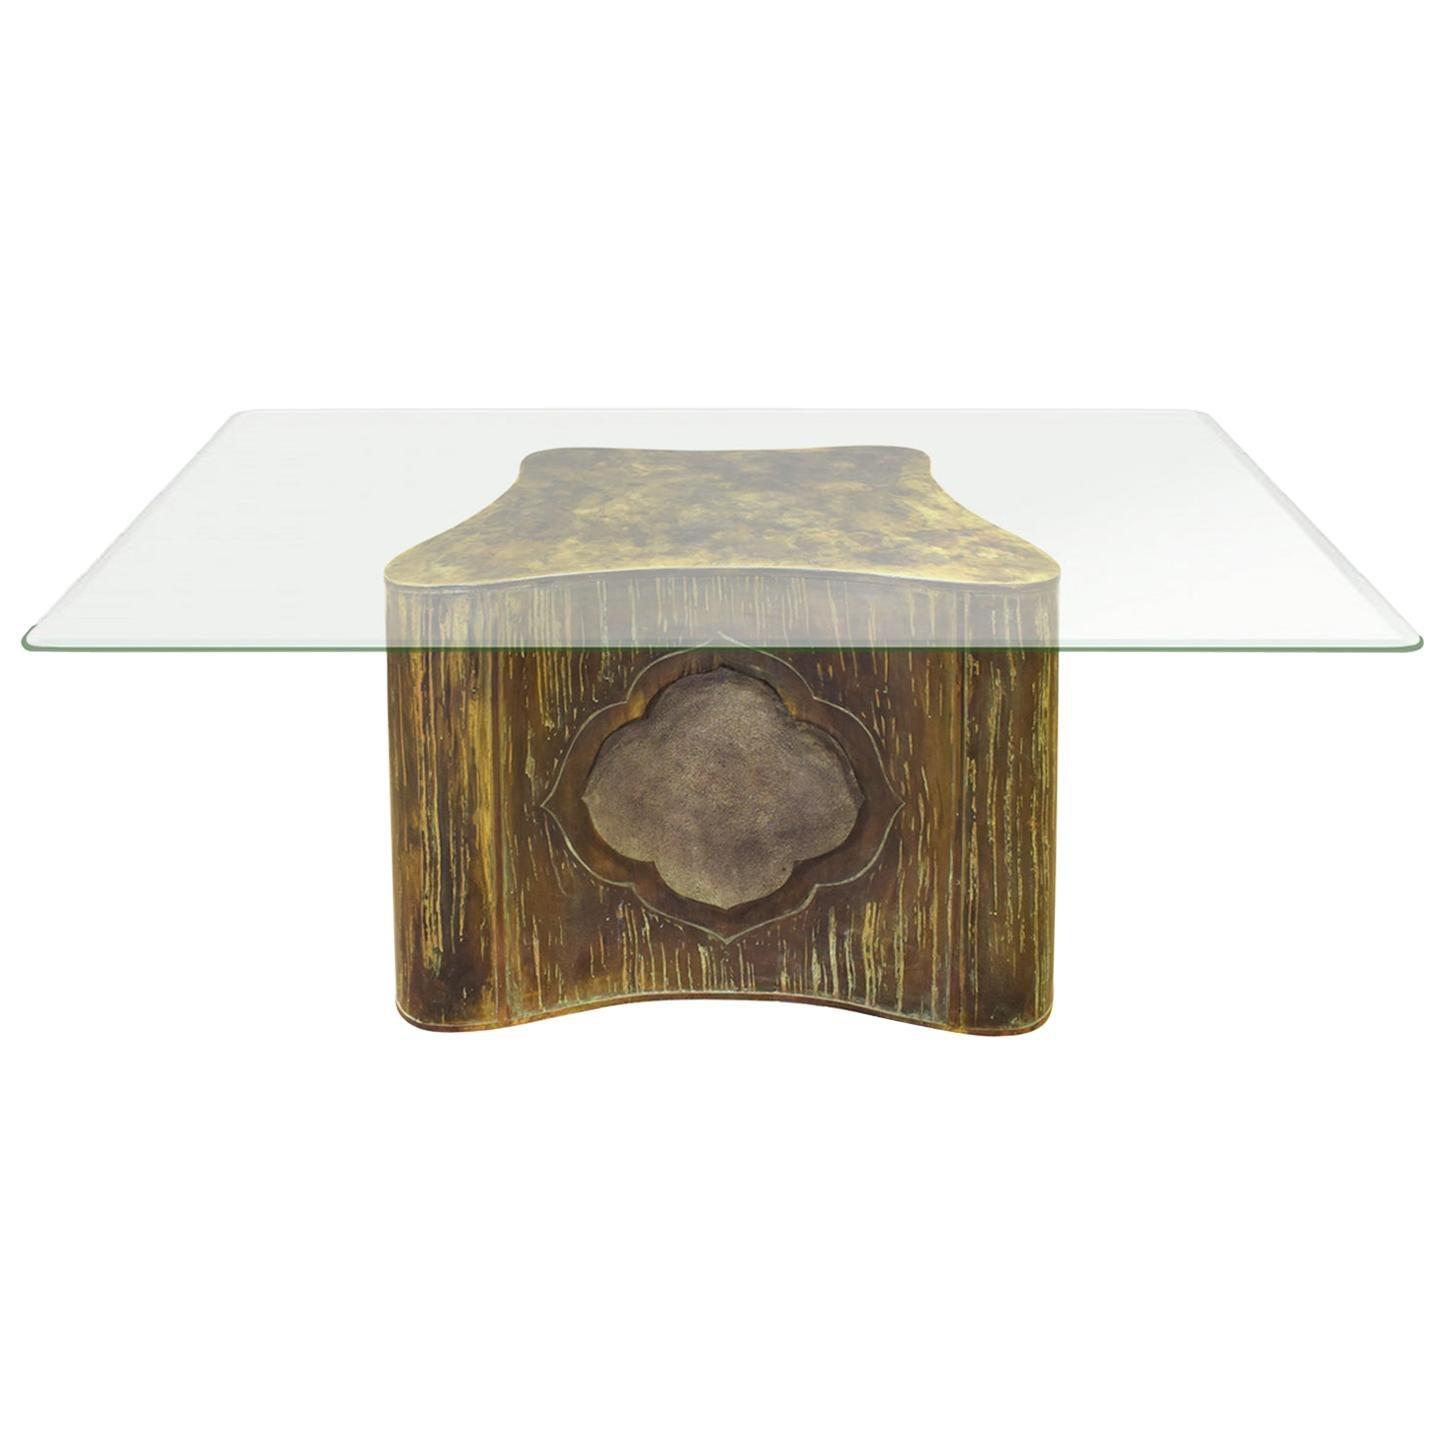 Philip & Kelvin LaVerne Unique Large Pedestal Dining Table, 1960s 'Signed'